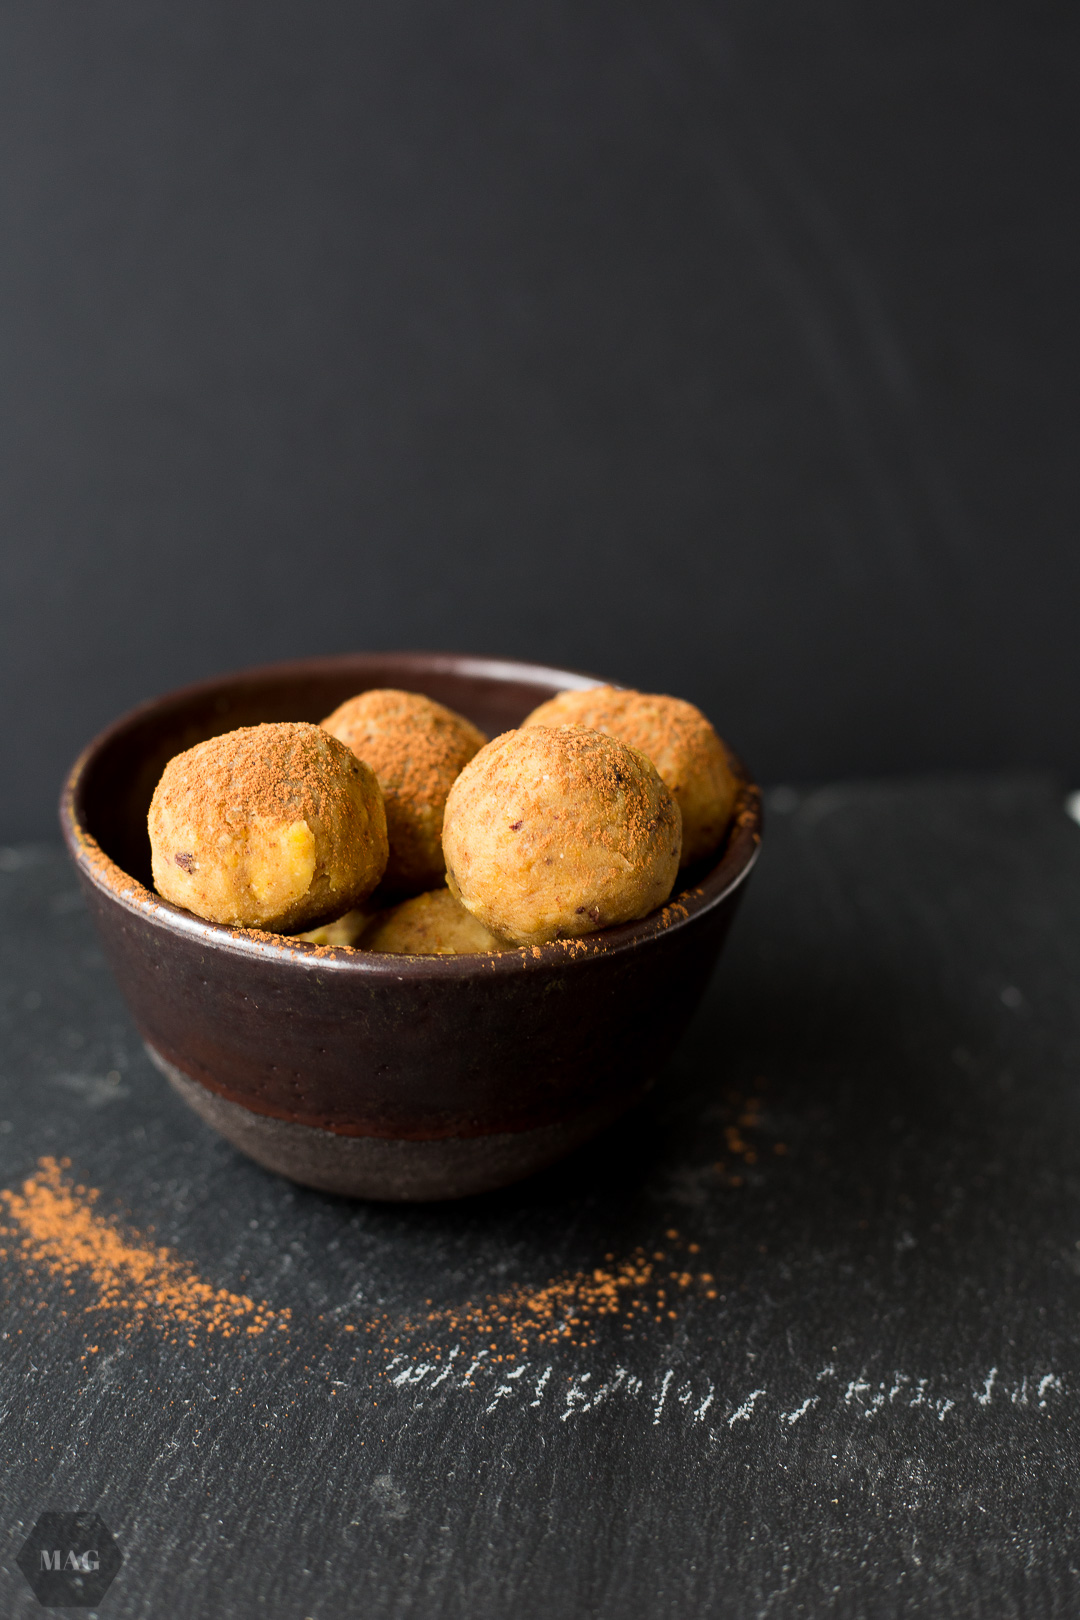 Cookie Dough Balls, Cookie Dough Bites, Cookie Dough, Kichererbsenbällchen, Cookie Dough vegan, cookie dough pralinen, cookie dough aus kichererbsen, cookie dough hummus